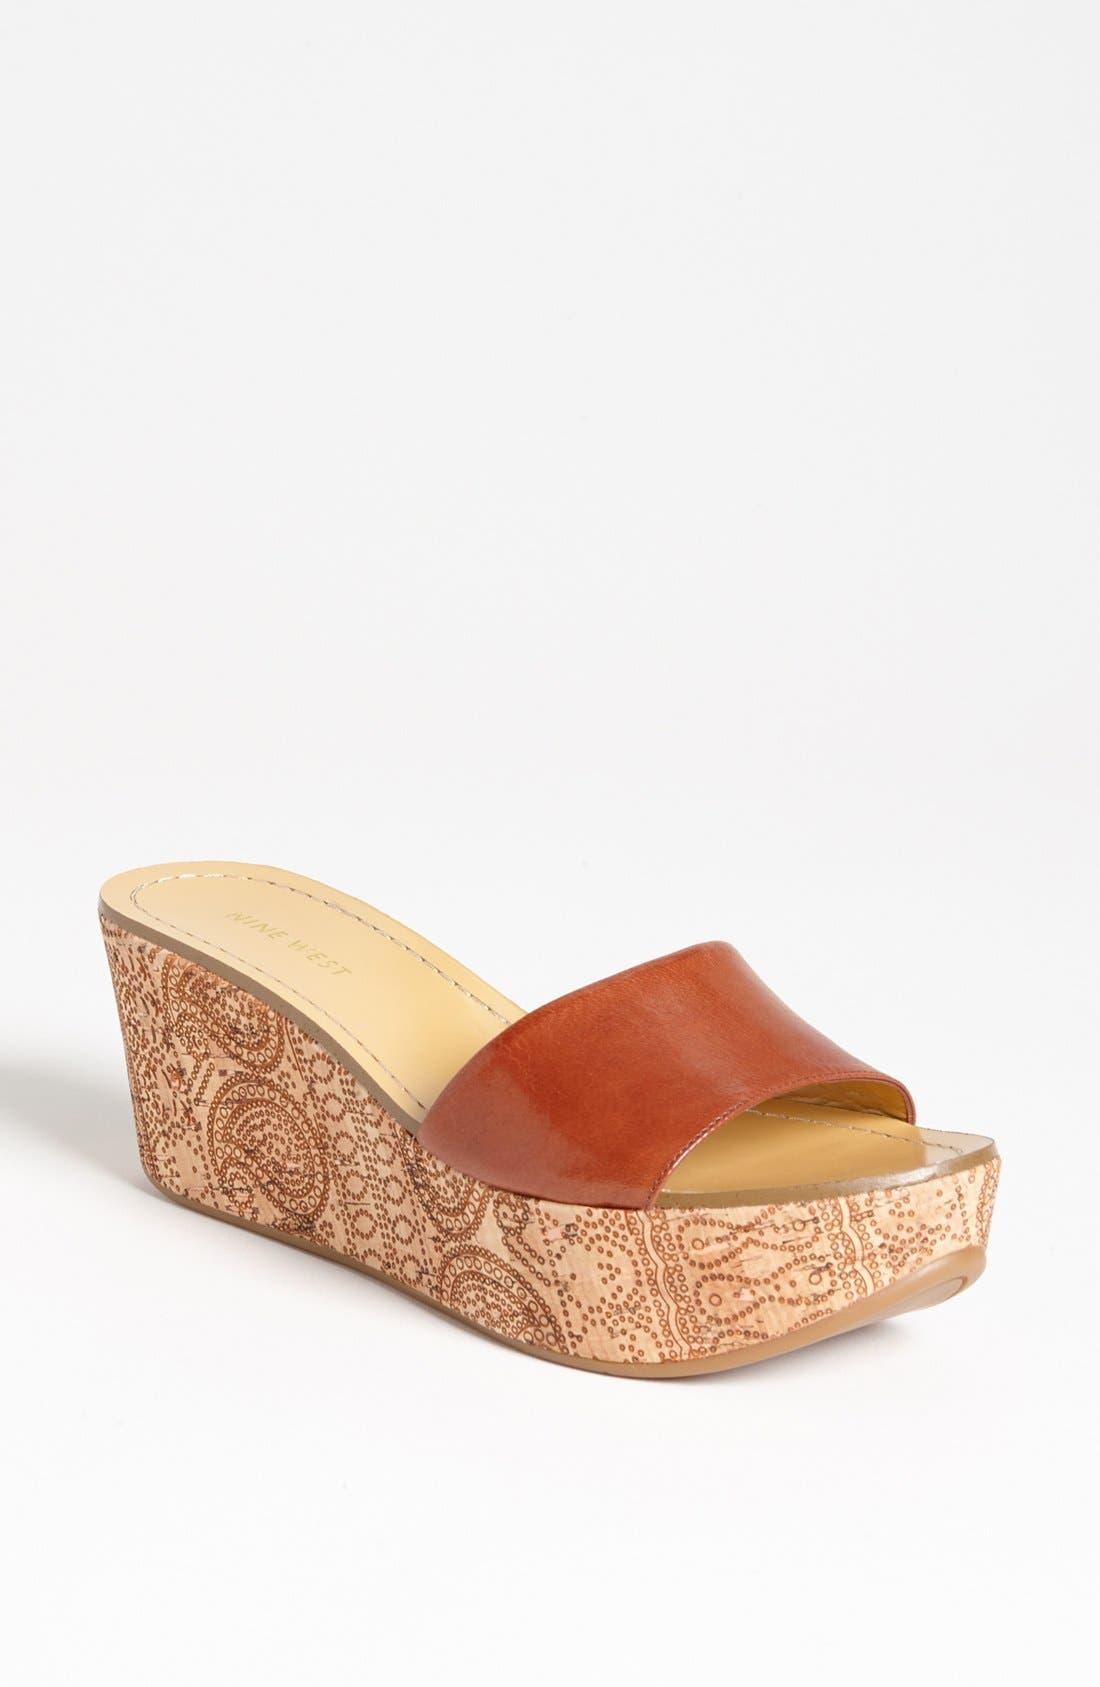 Alternate Image 1 Selected - Nine West 'Relax' Sandal